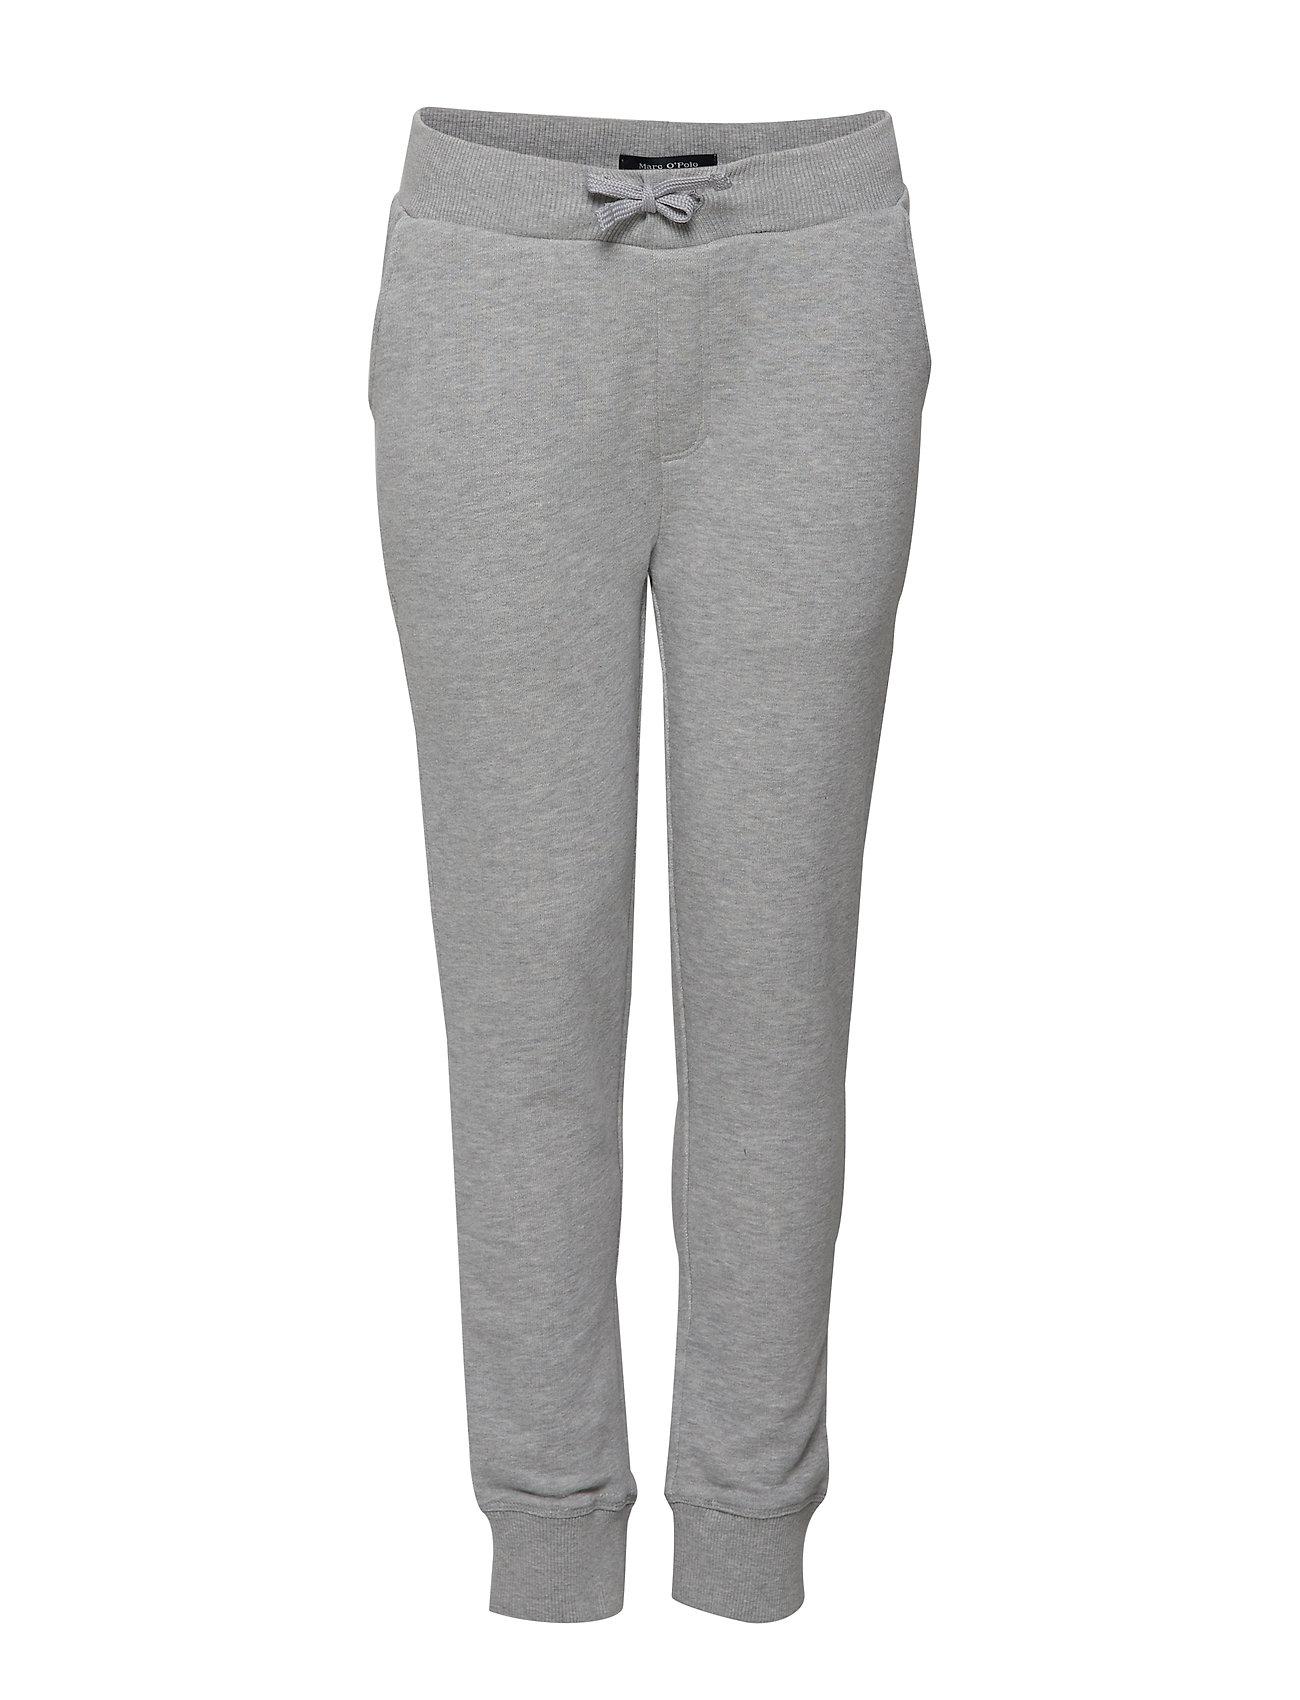 Marc O'Polo Junior jogging pants - MITTELGRAU MELANGE-GRAY